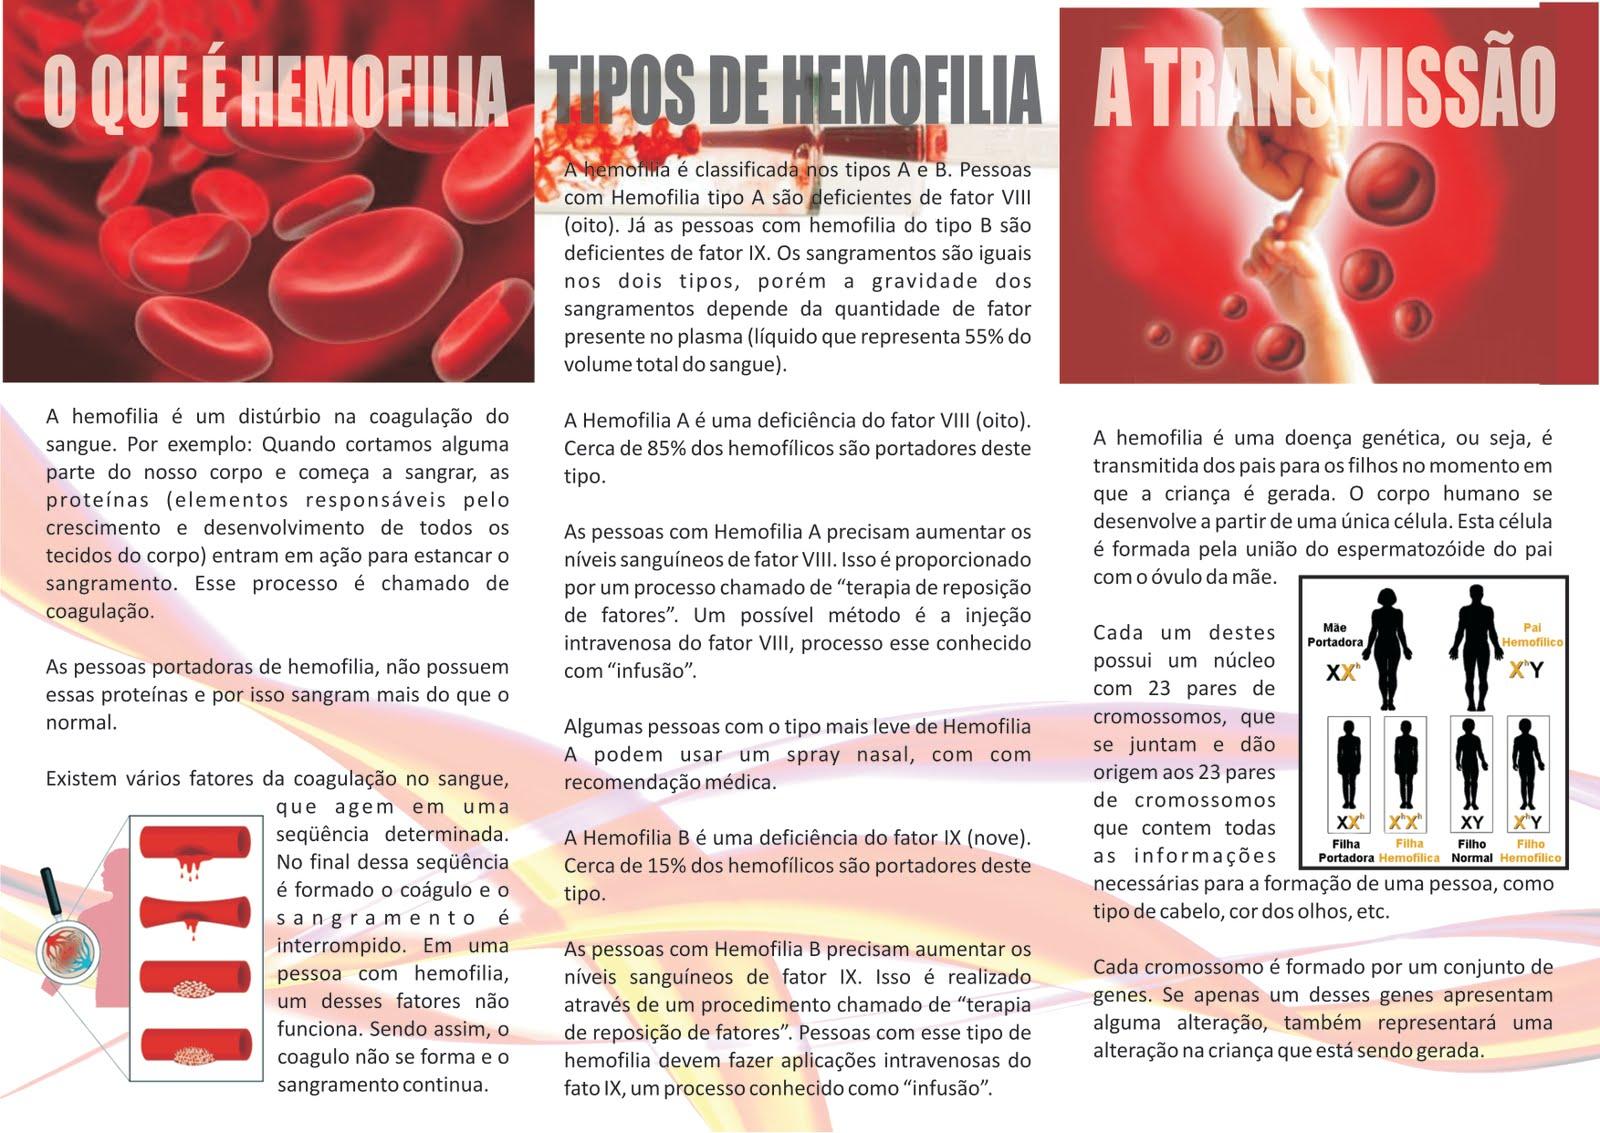 http://2.bp.blogspot.com/-BSLyVOaxxtY/UW9hE7EIeRI/AAAAAAAAArI/CaUbHlCZCMk/s1600/hemofilia_pg2.jpg